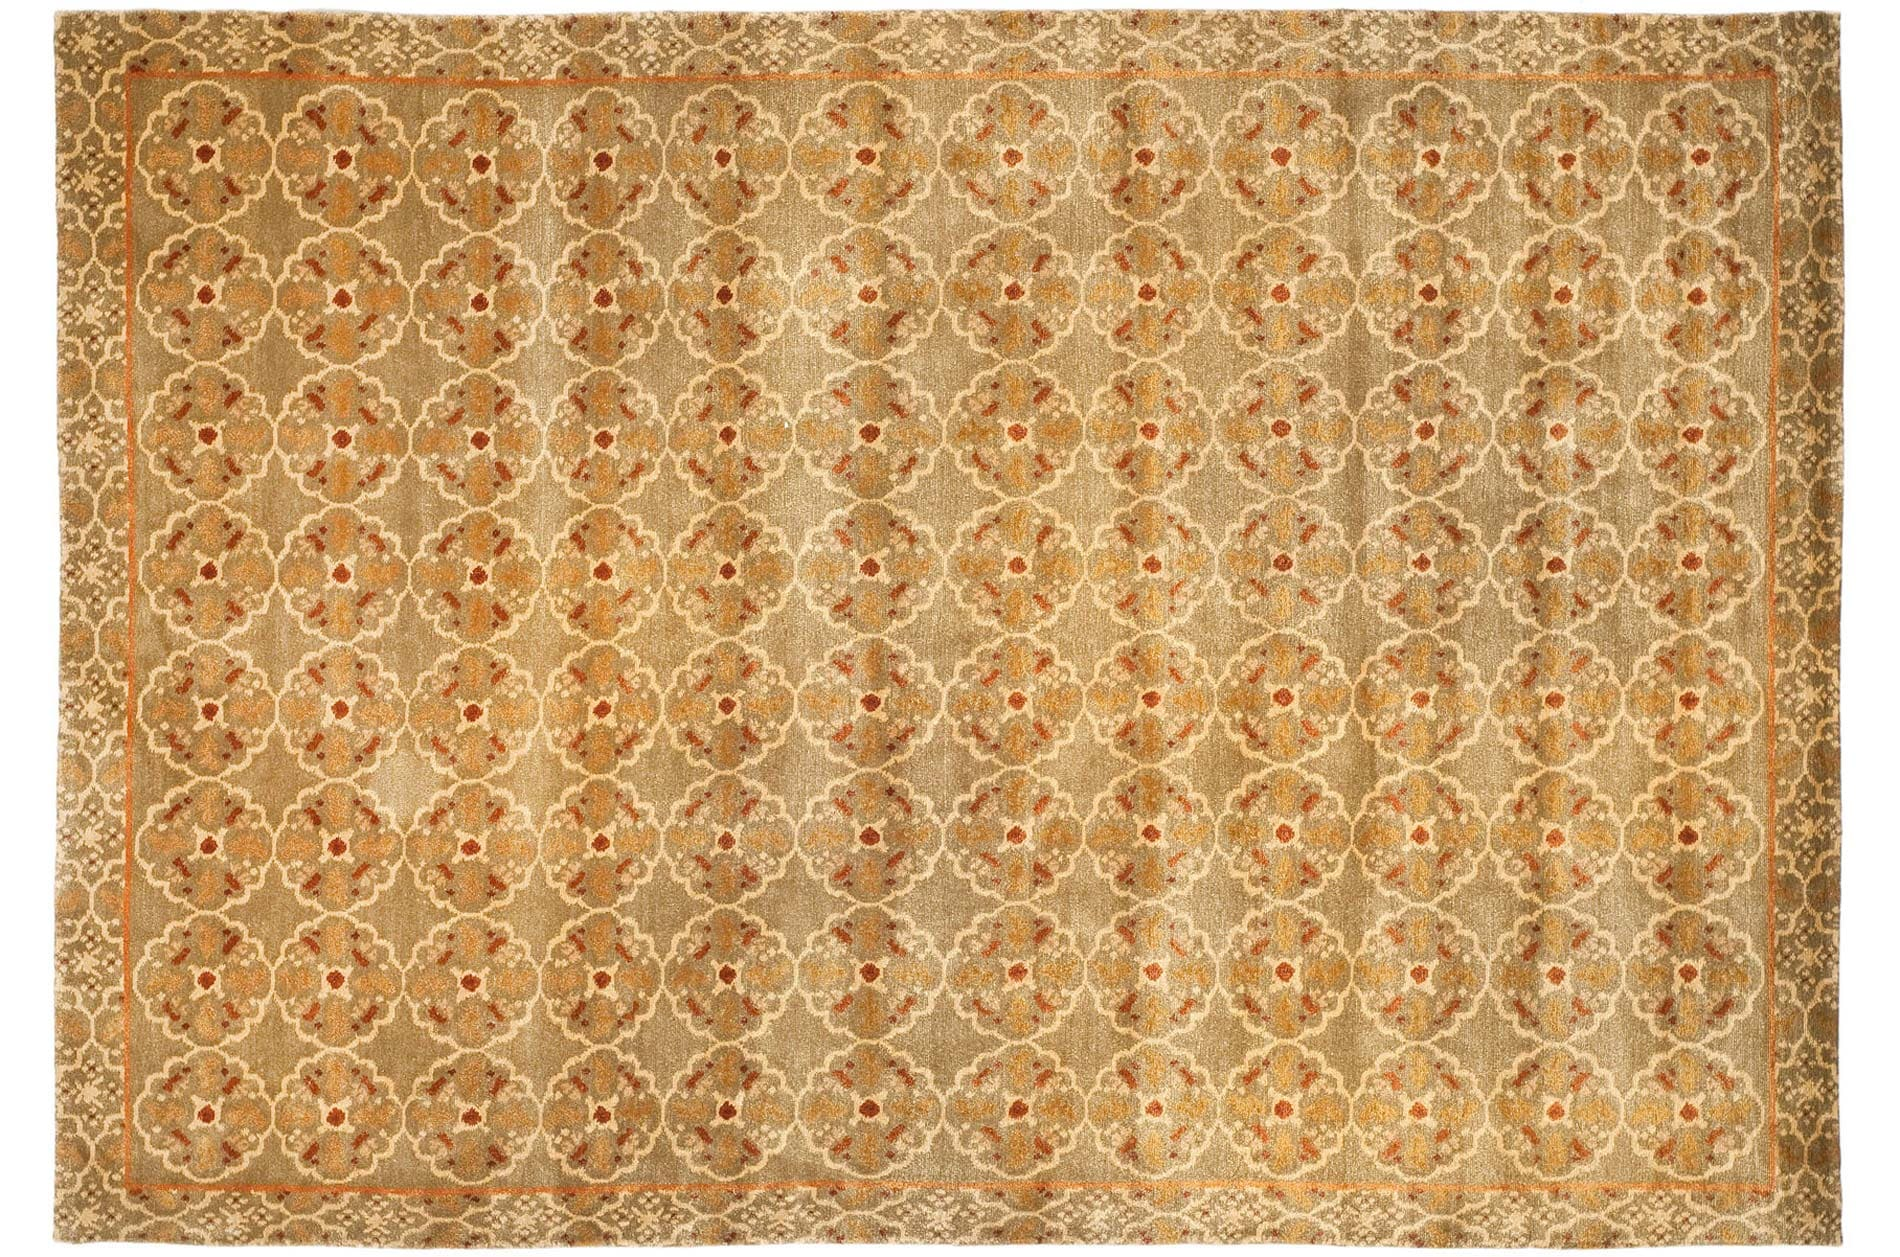 Handmade Thomas O'Brien Caniato Terracotta Wool/ Silk Rug (6' x 9')